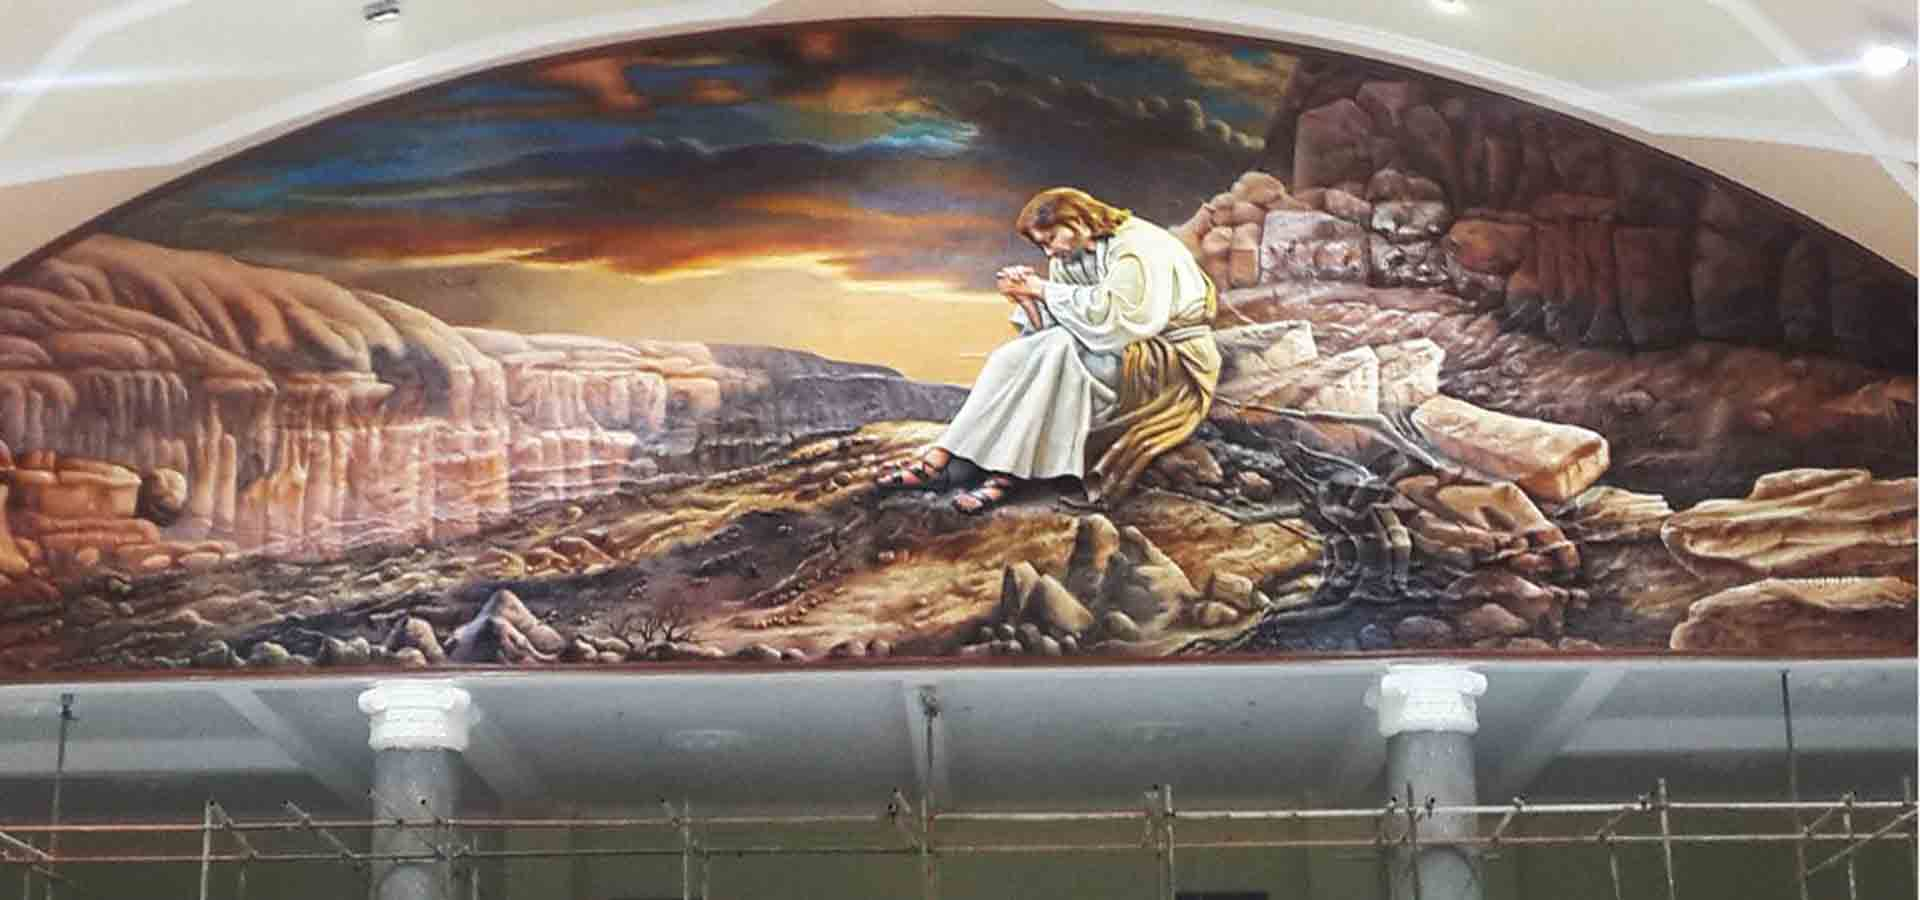 Church Art Project 2